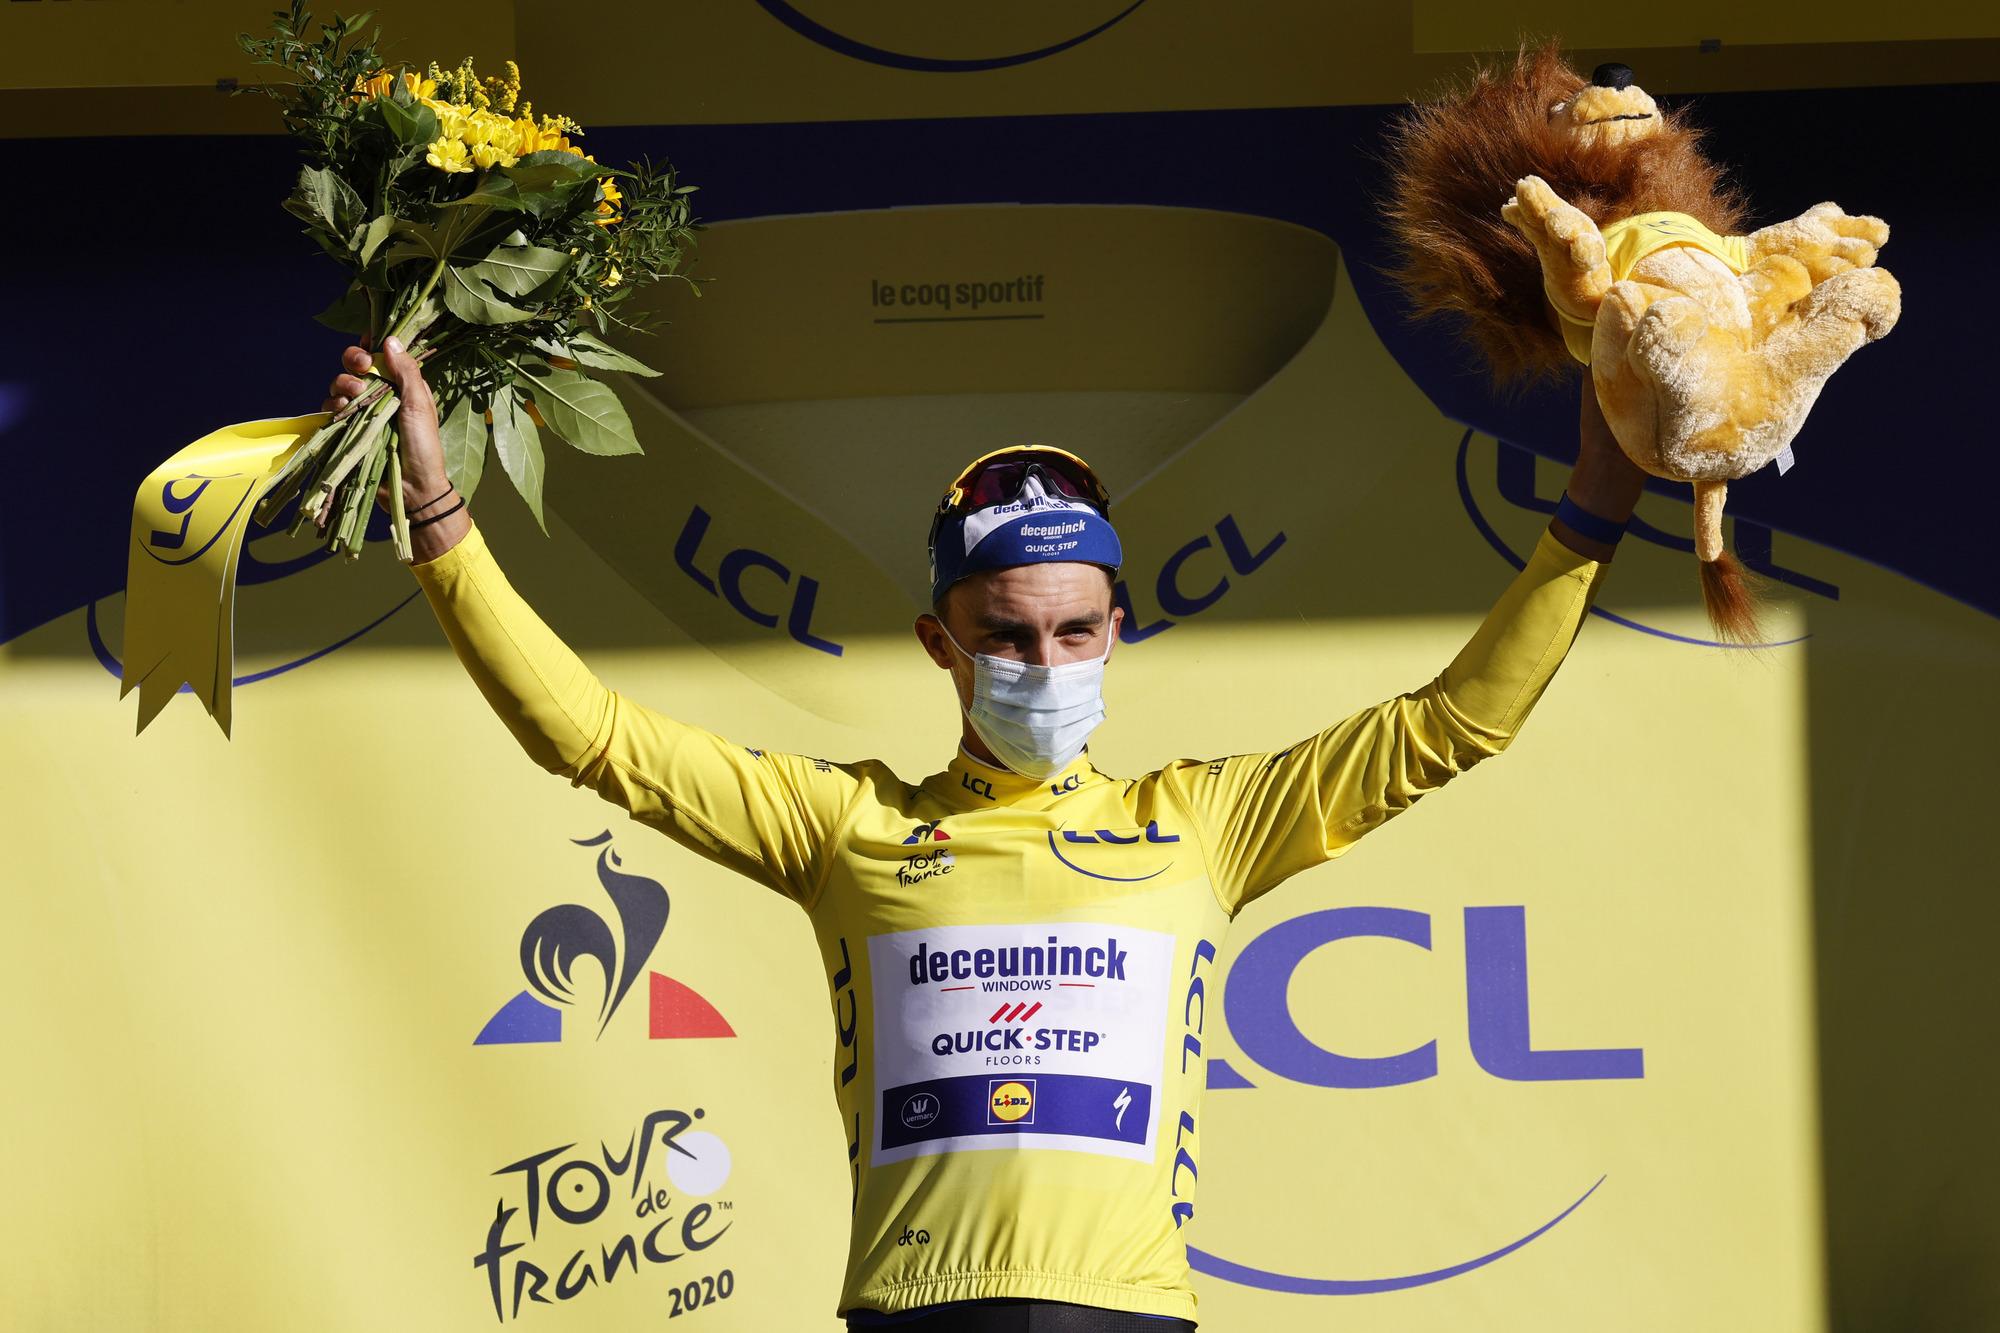 Tour de France 2020 107th Edition 4th stage Sisteron Orcieres Merlette 1605 km 01092020 Julian Alaphilippe FRA Deceuninck Quick Step photo POOL Yuzuru SunadaBettiniPhoto2020